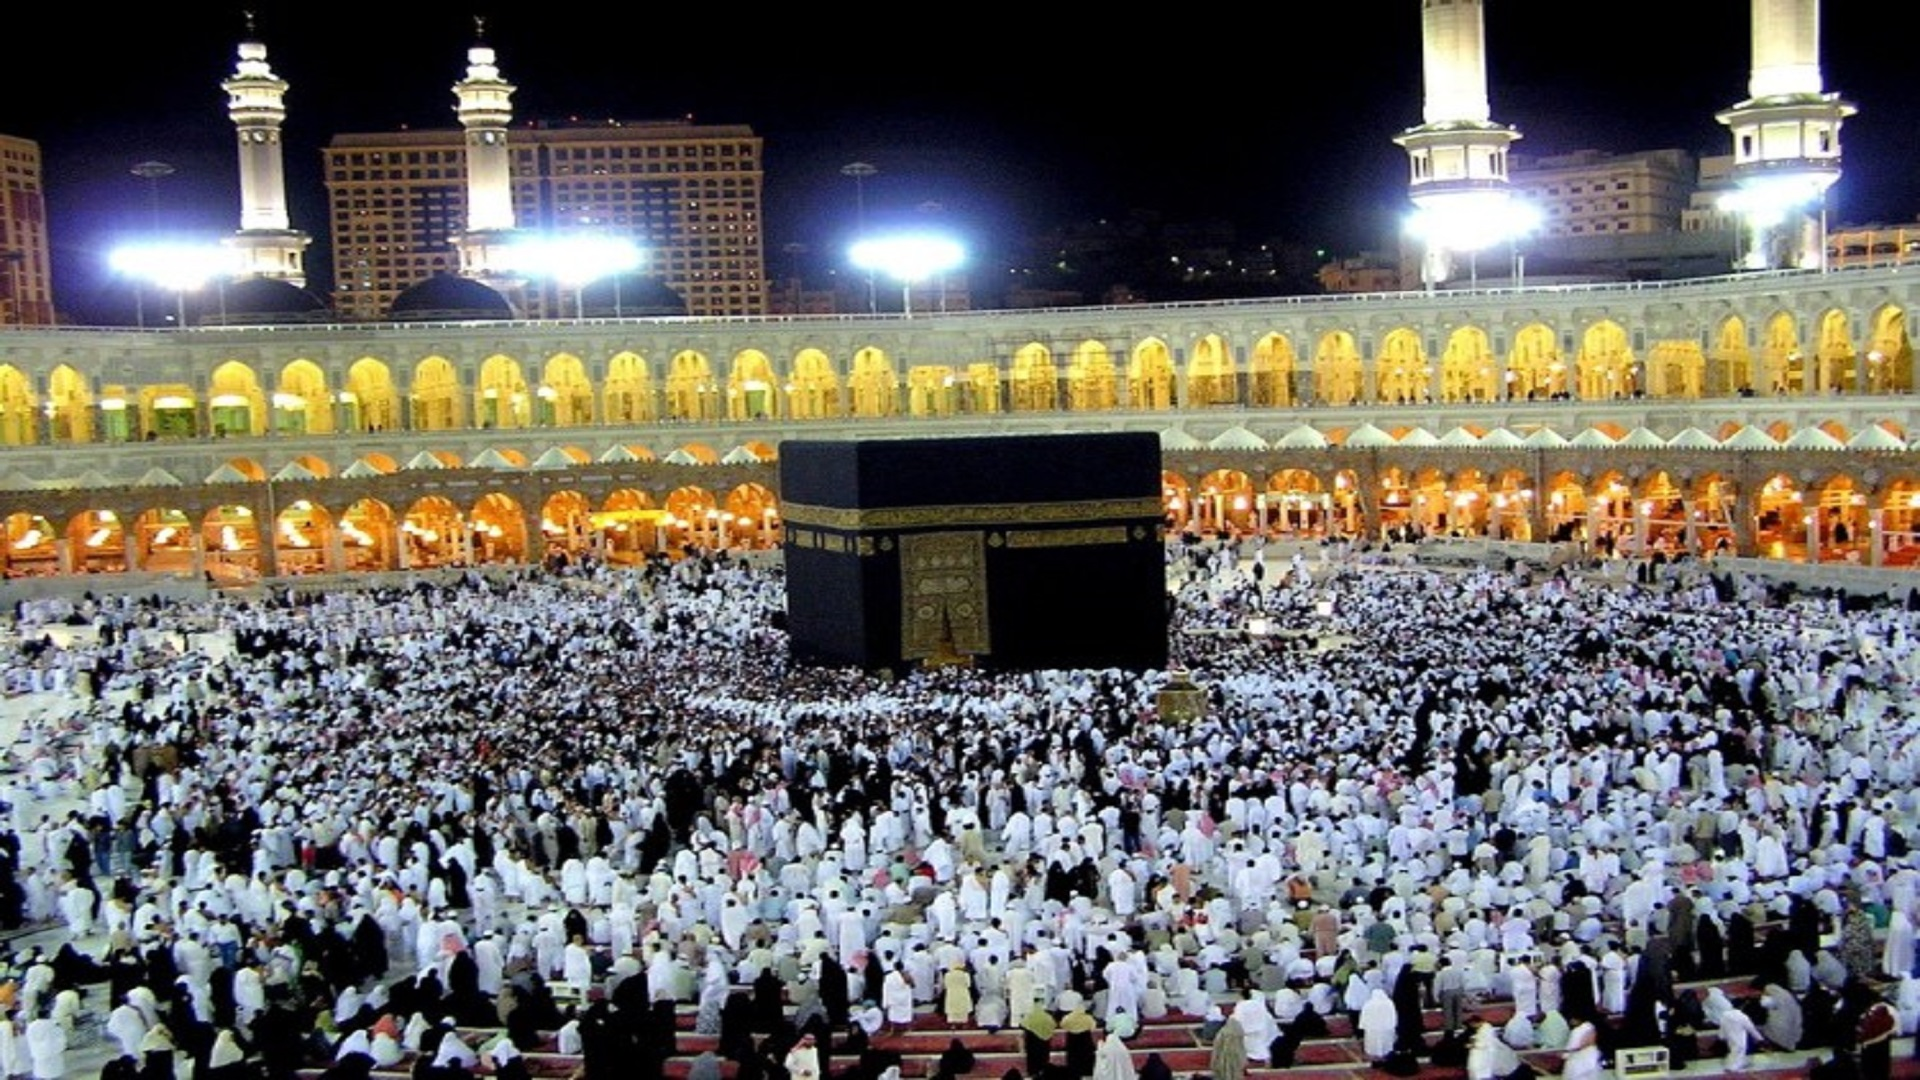 Khana-Kaaba-Beautiful-Wallappers-Free-Hd - Hd Wallpaper-6387